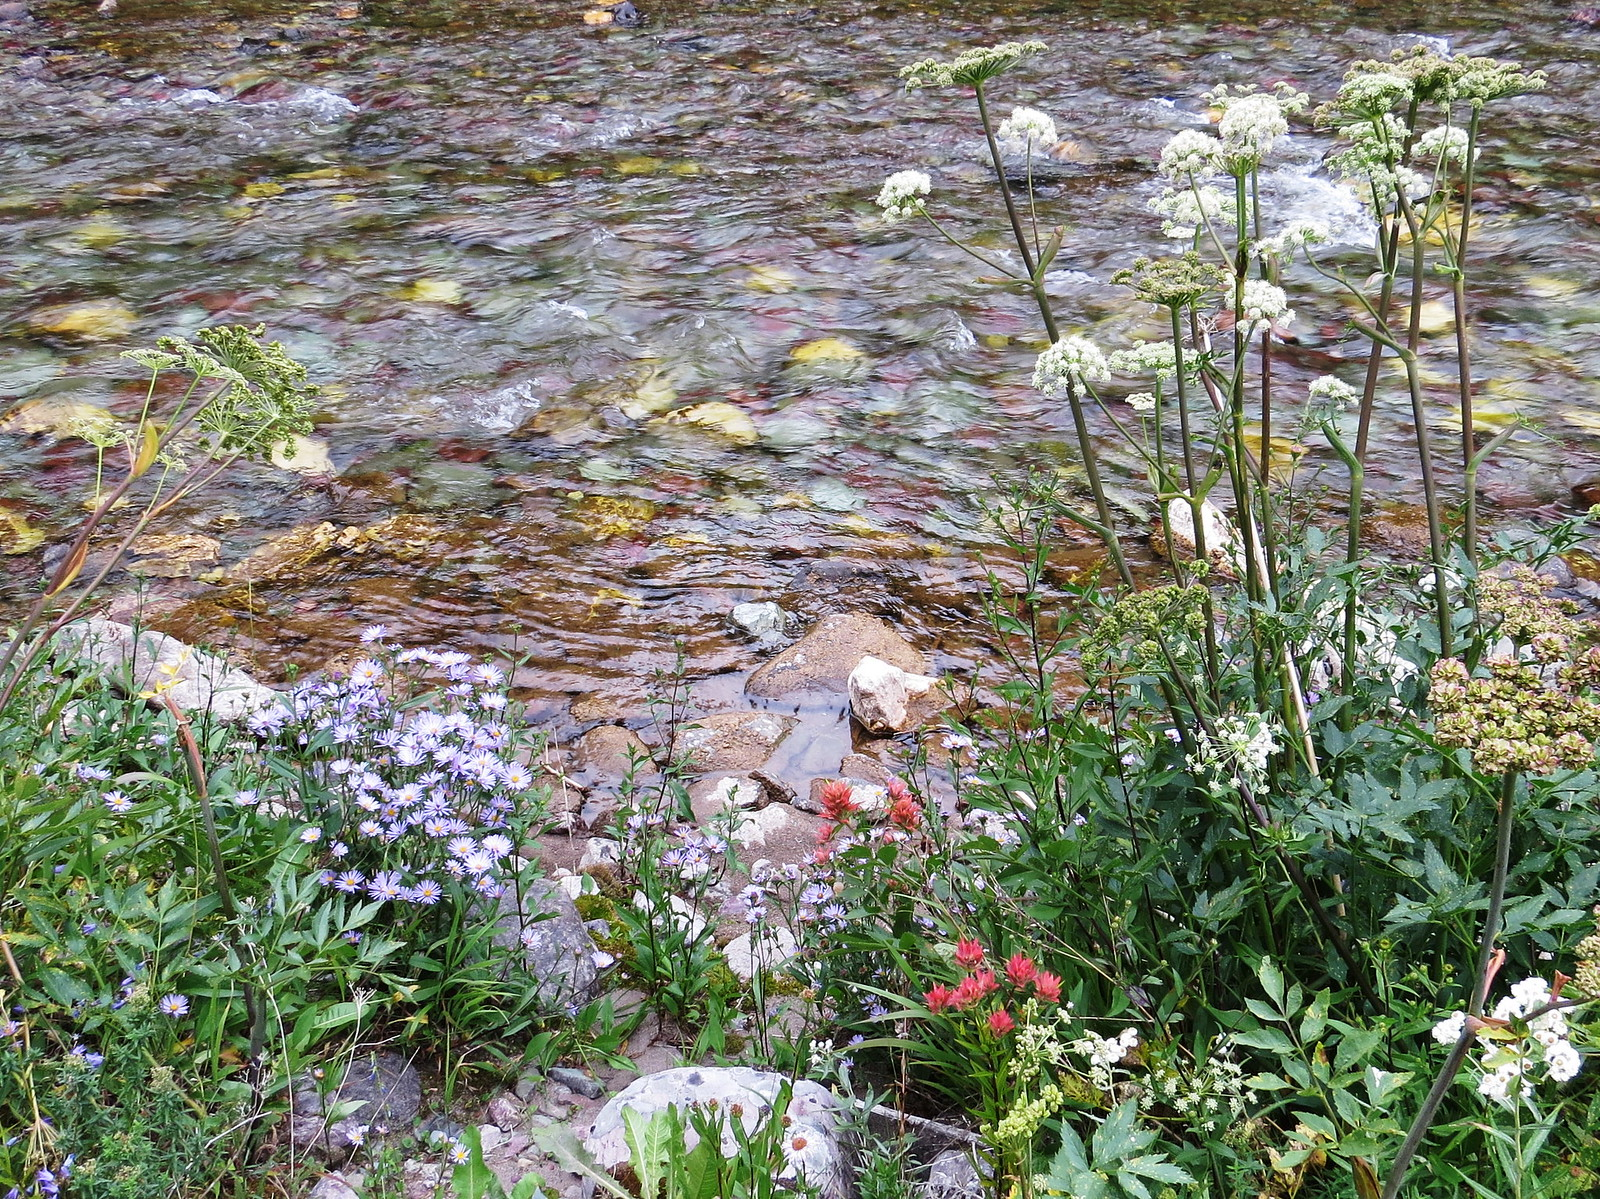 Two Medicine Creek, Blackfeet Glacier, Montana